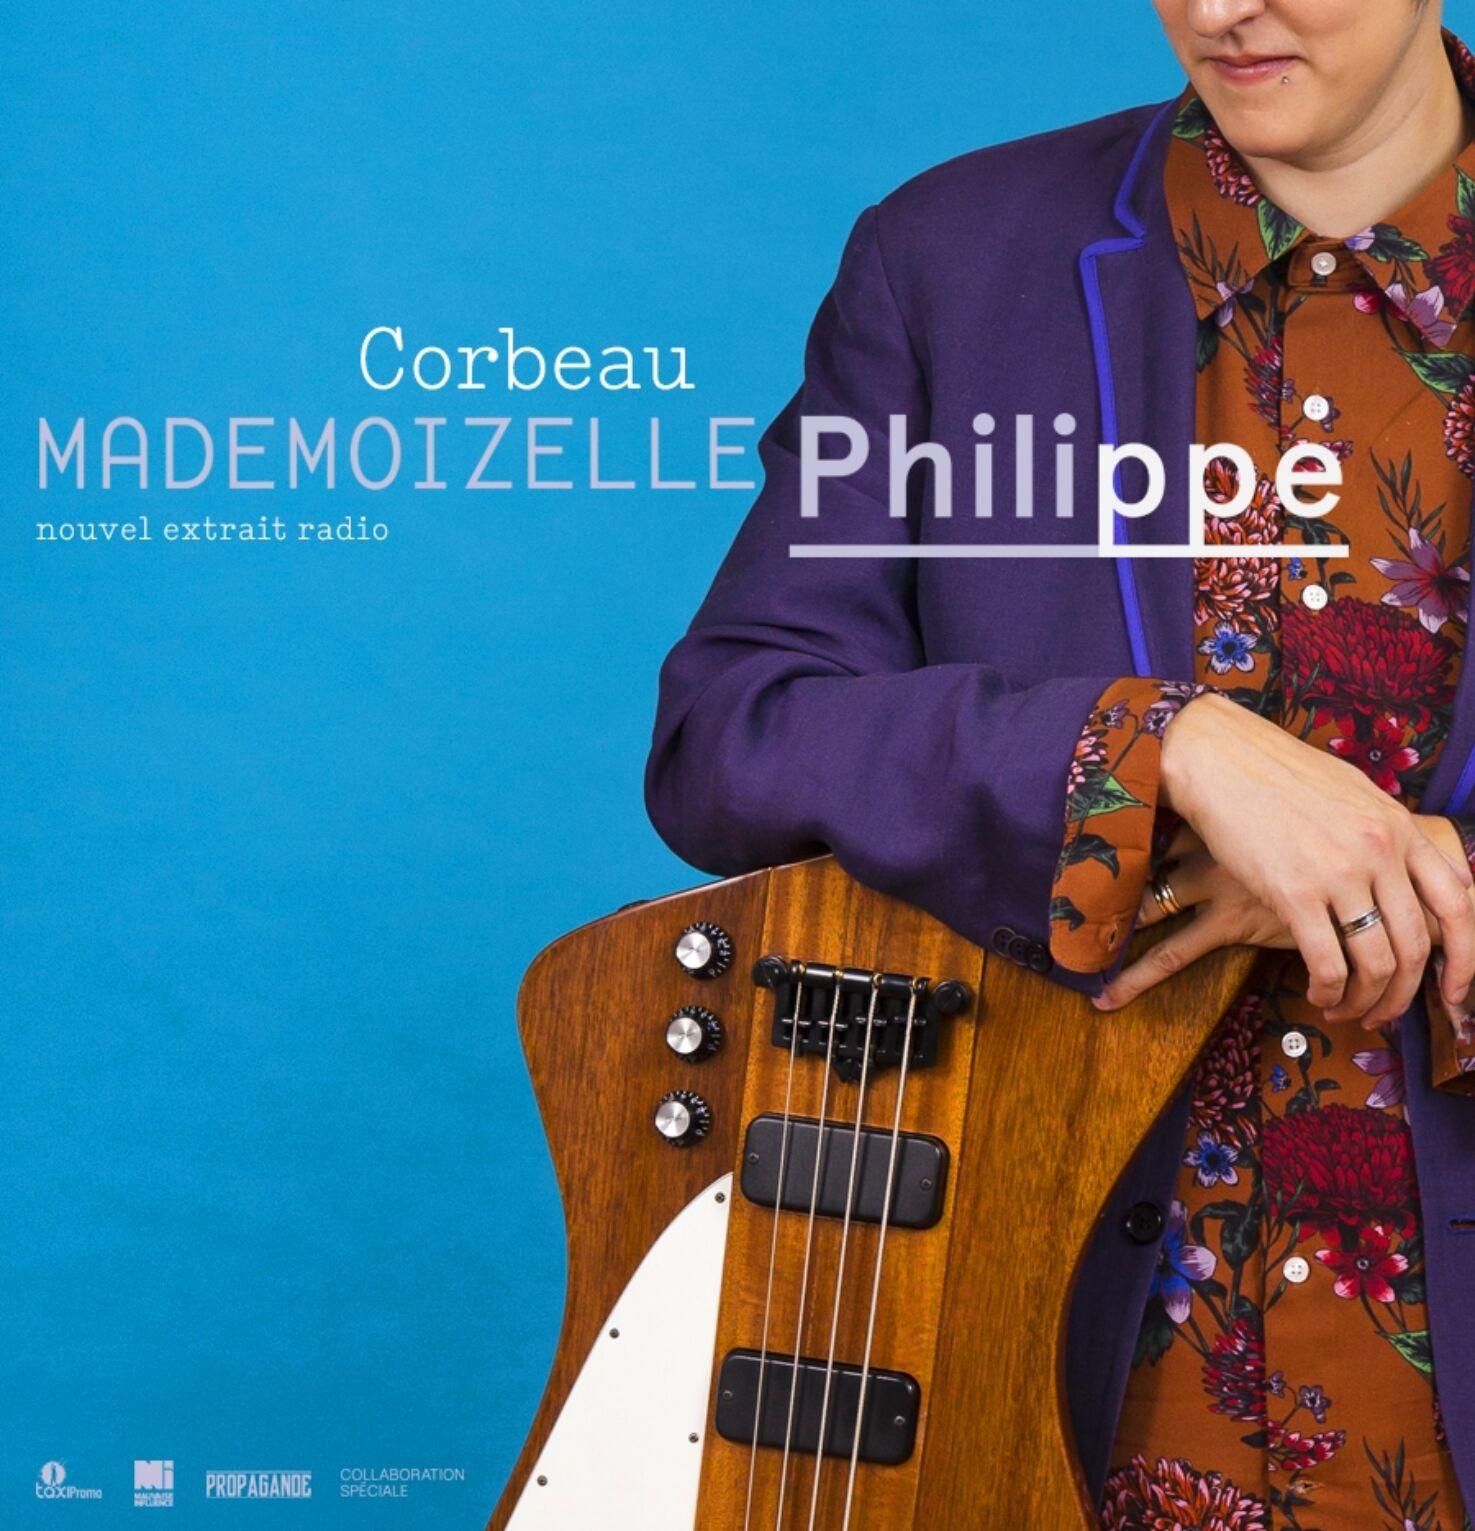 Mademoizelle Philippe